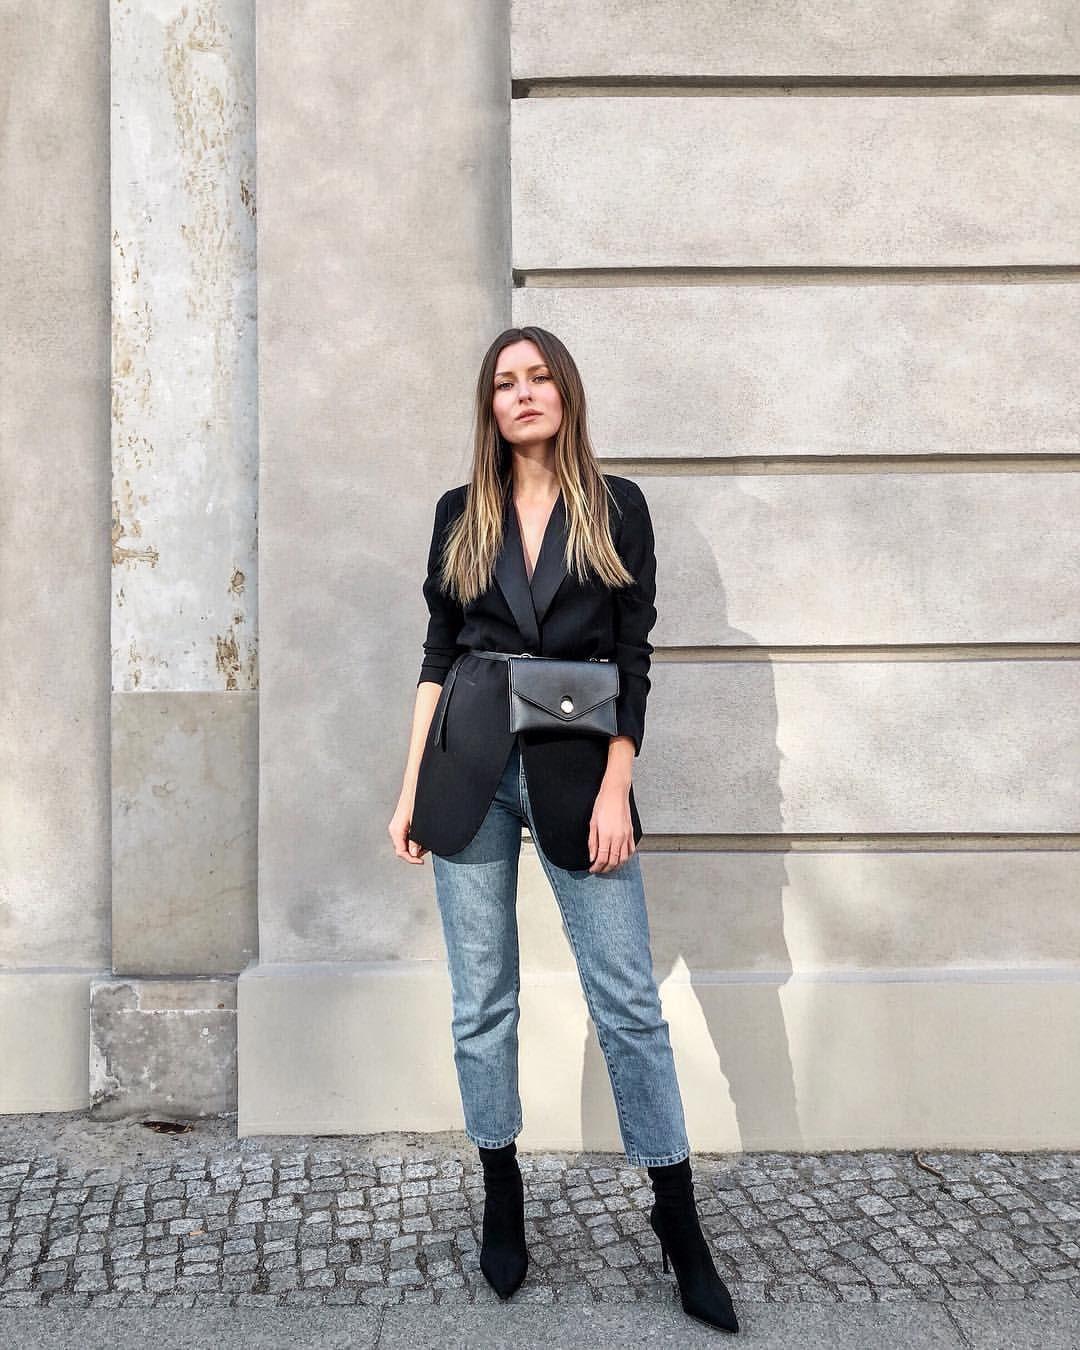 Belt bag, black blazer, mom jeans, sock boots, outfit, street style, Livia  Auer, Paris Fashion Week, Milan Fashion Week